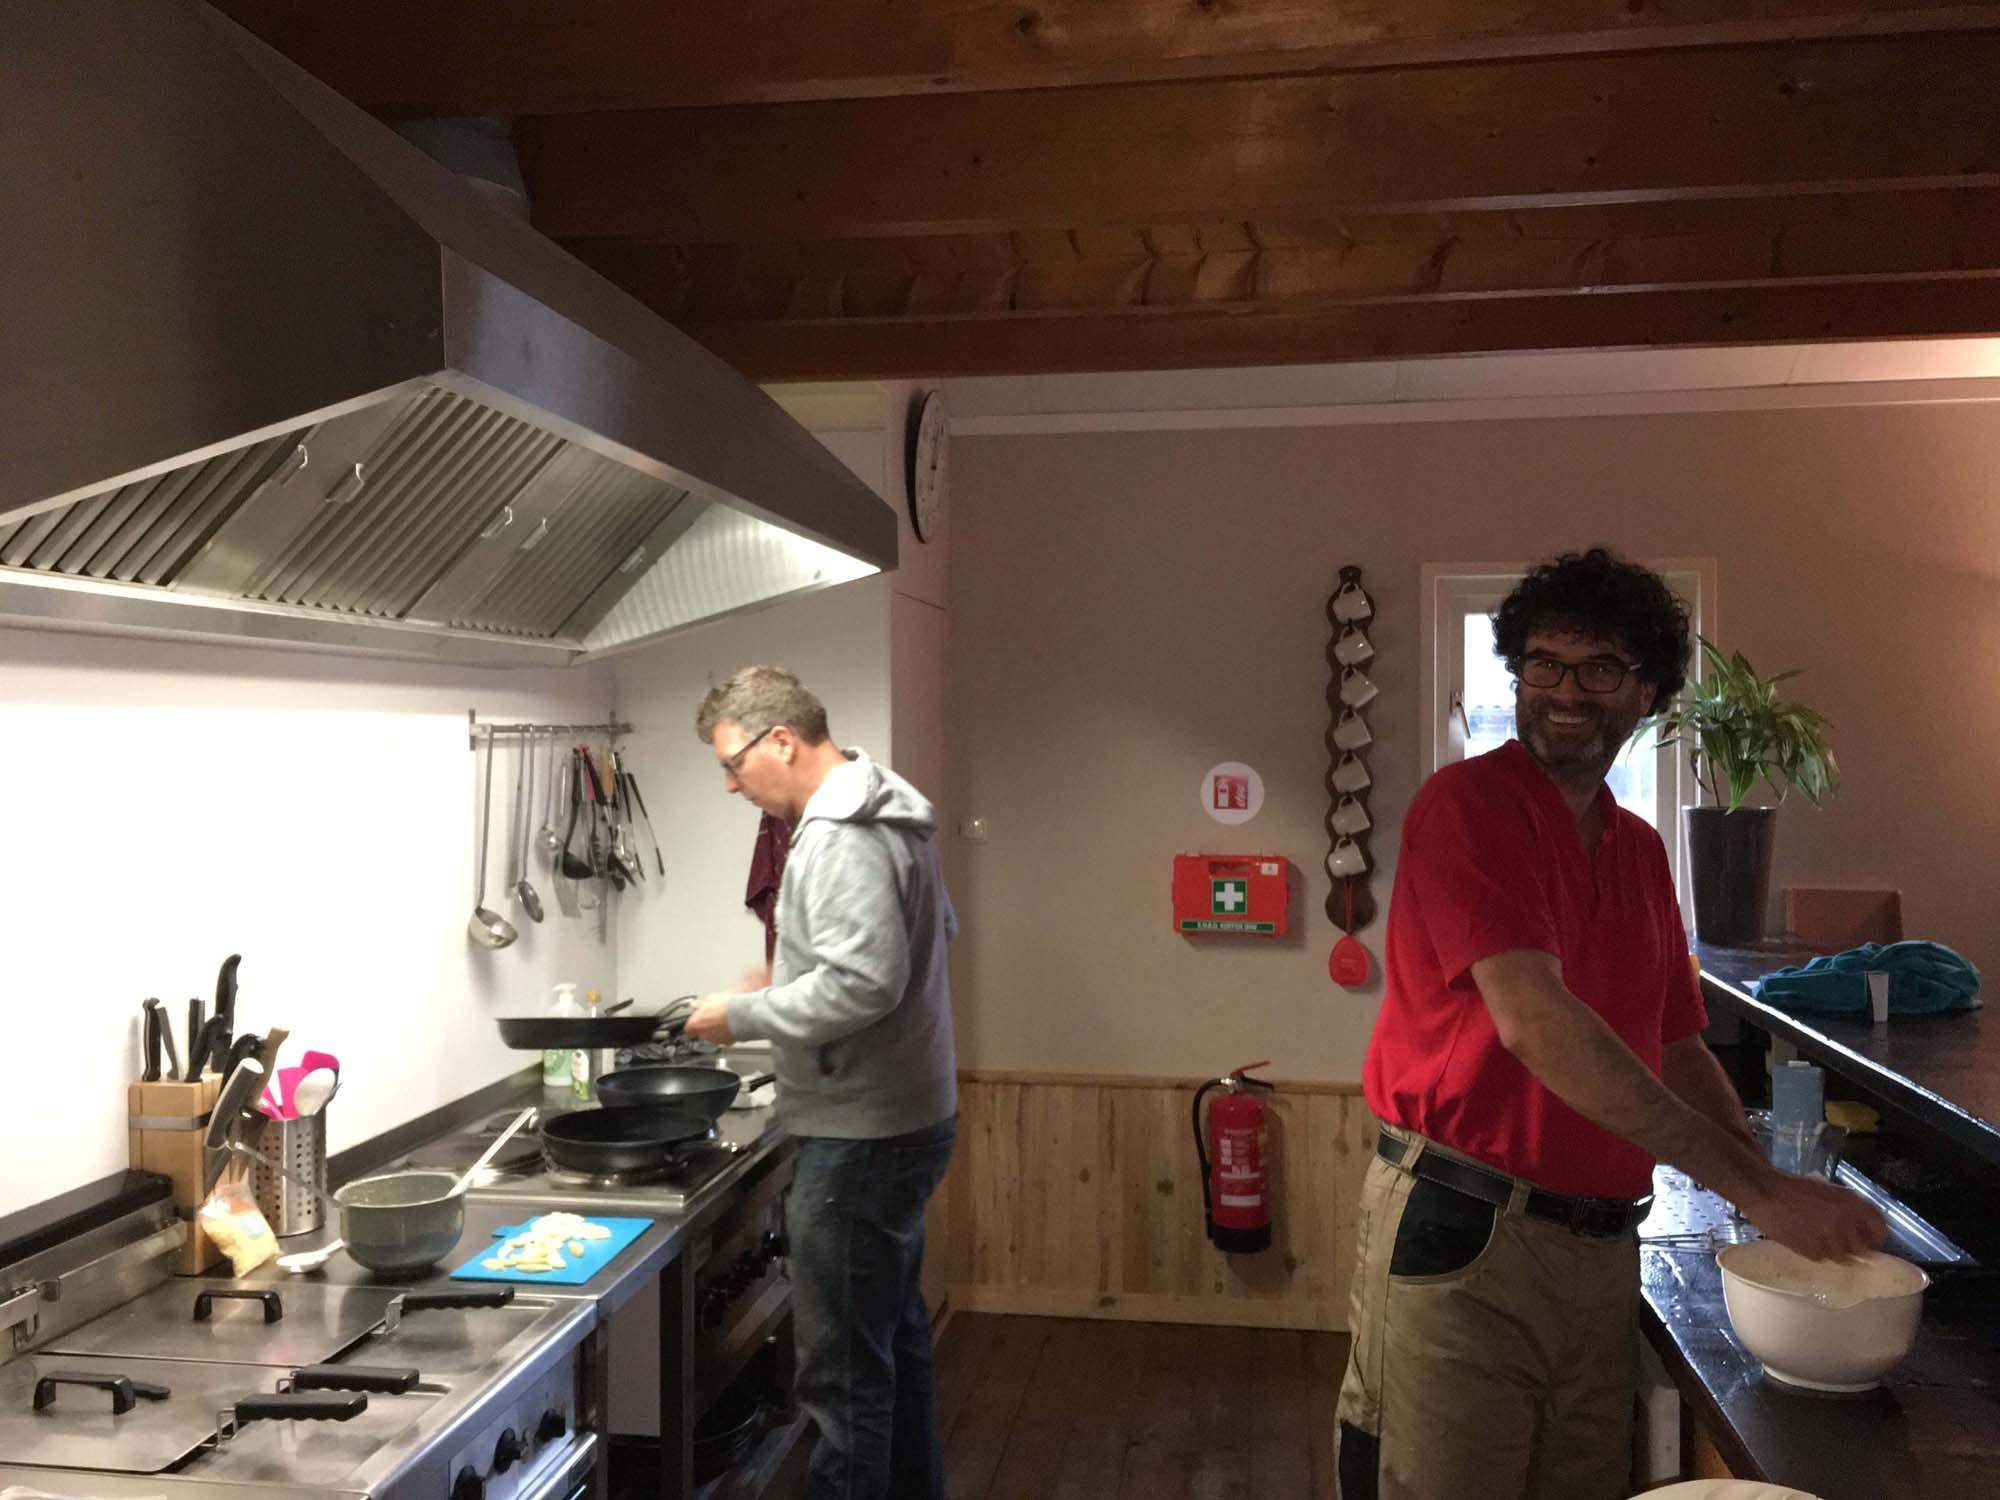 In de keuken op zorgboerderij Boerewille Friesland